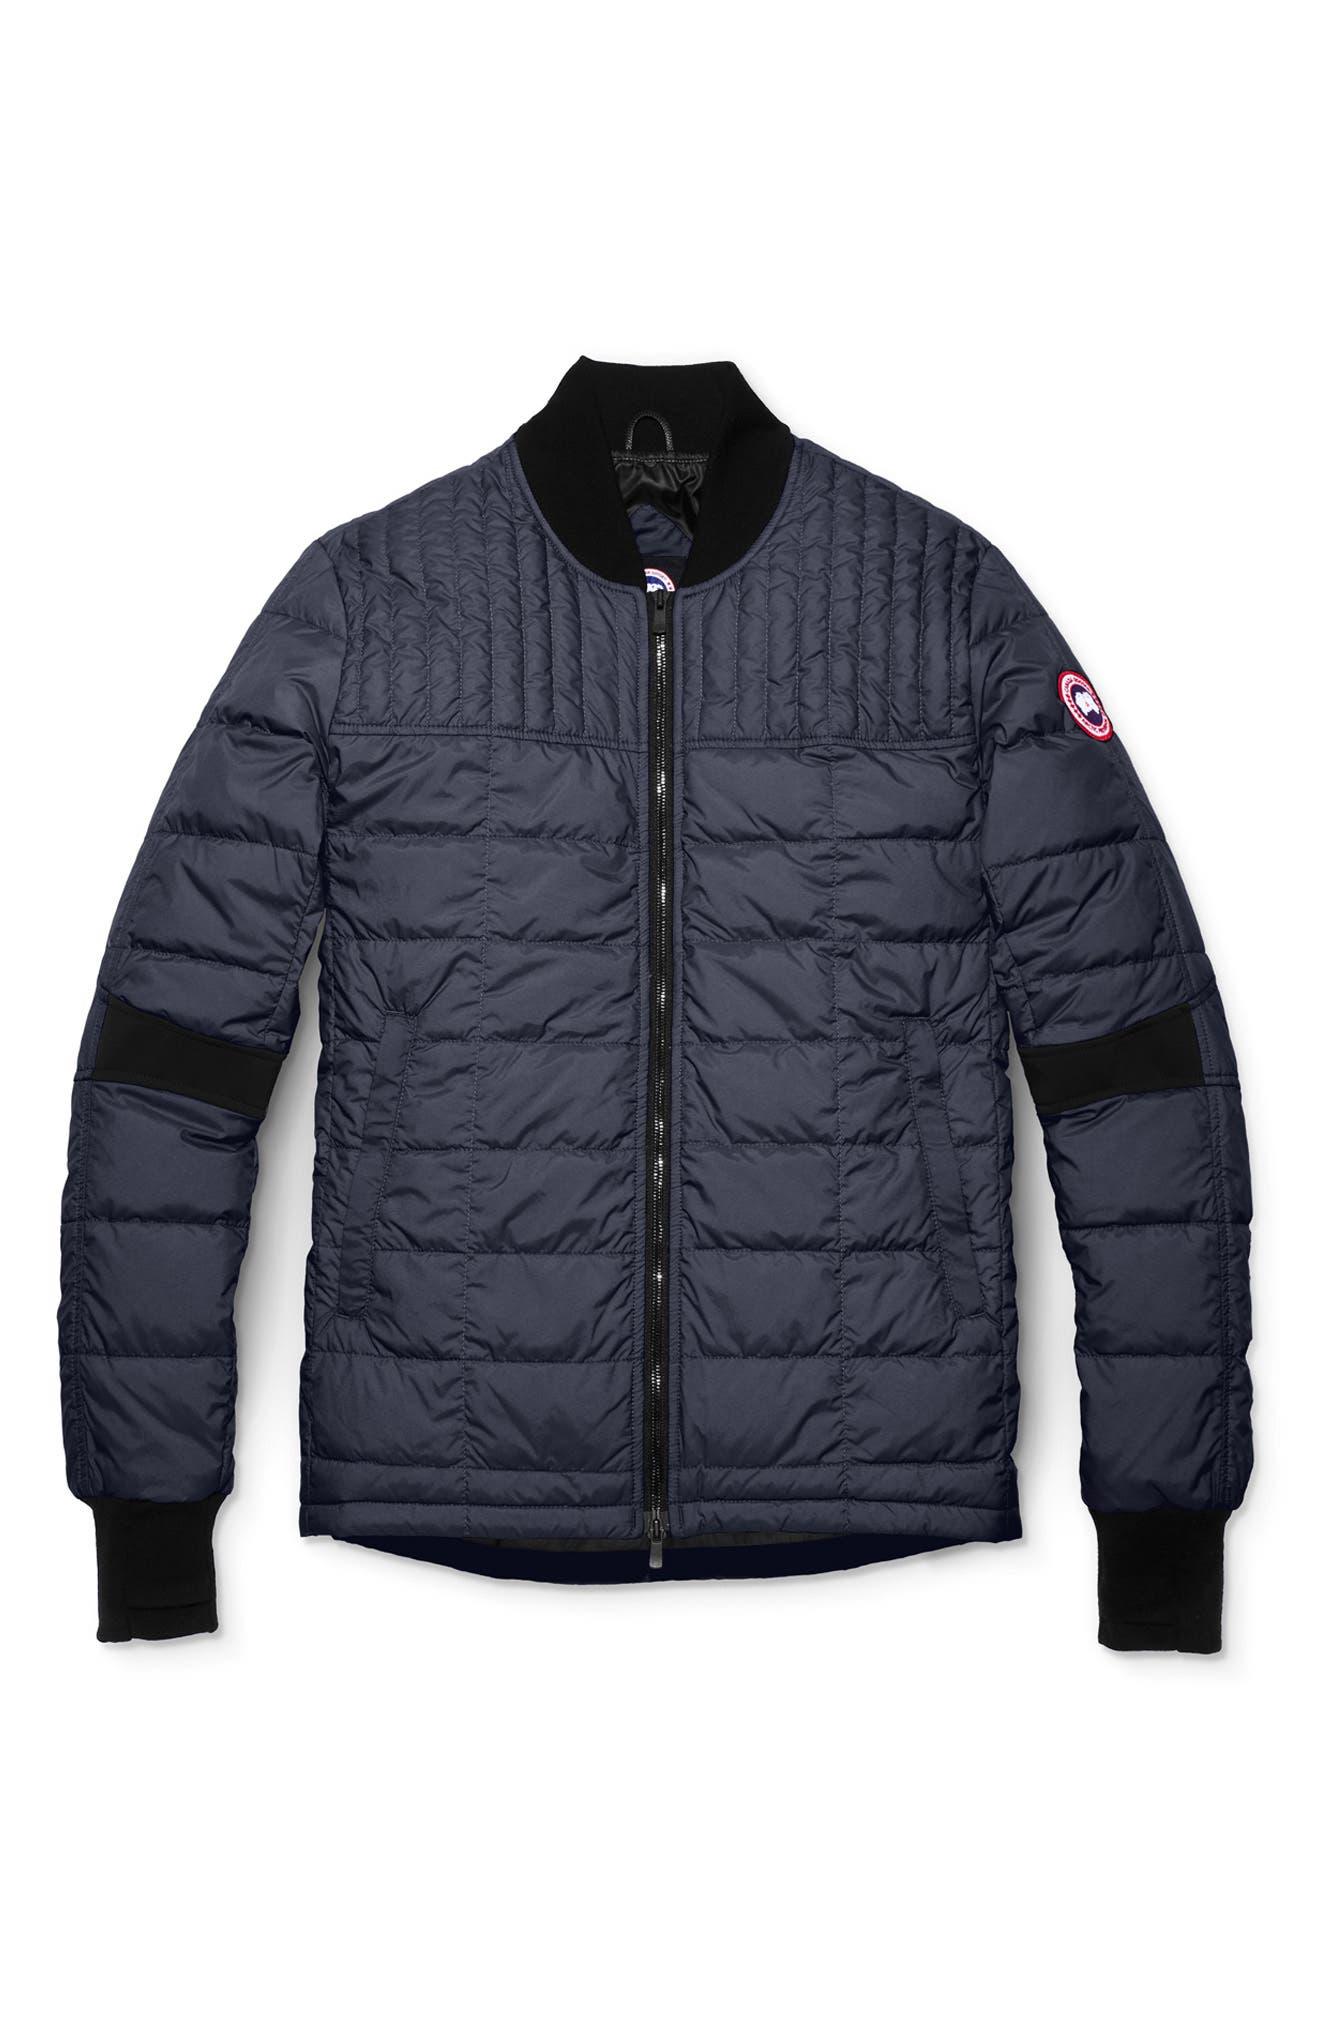 CANADA GOOSE, Dunham Slim Fit Packable Down Jacket, Main thumbnail 1, color, NAVY